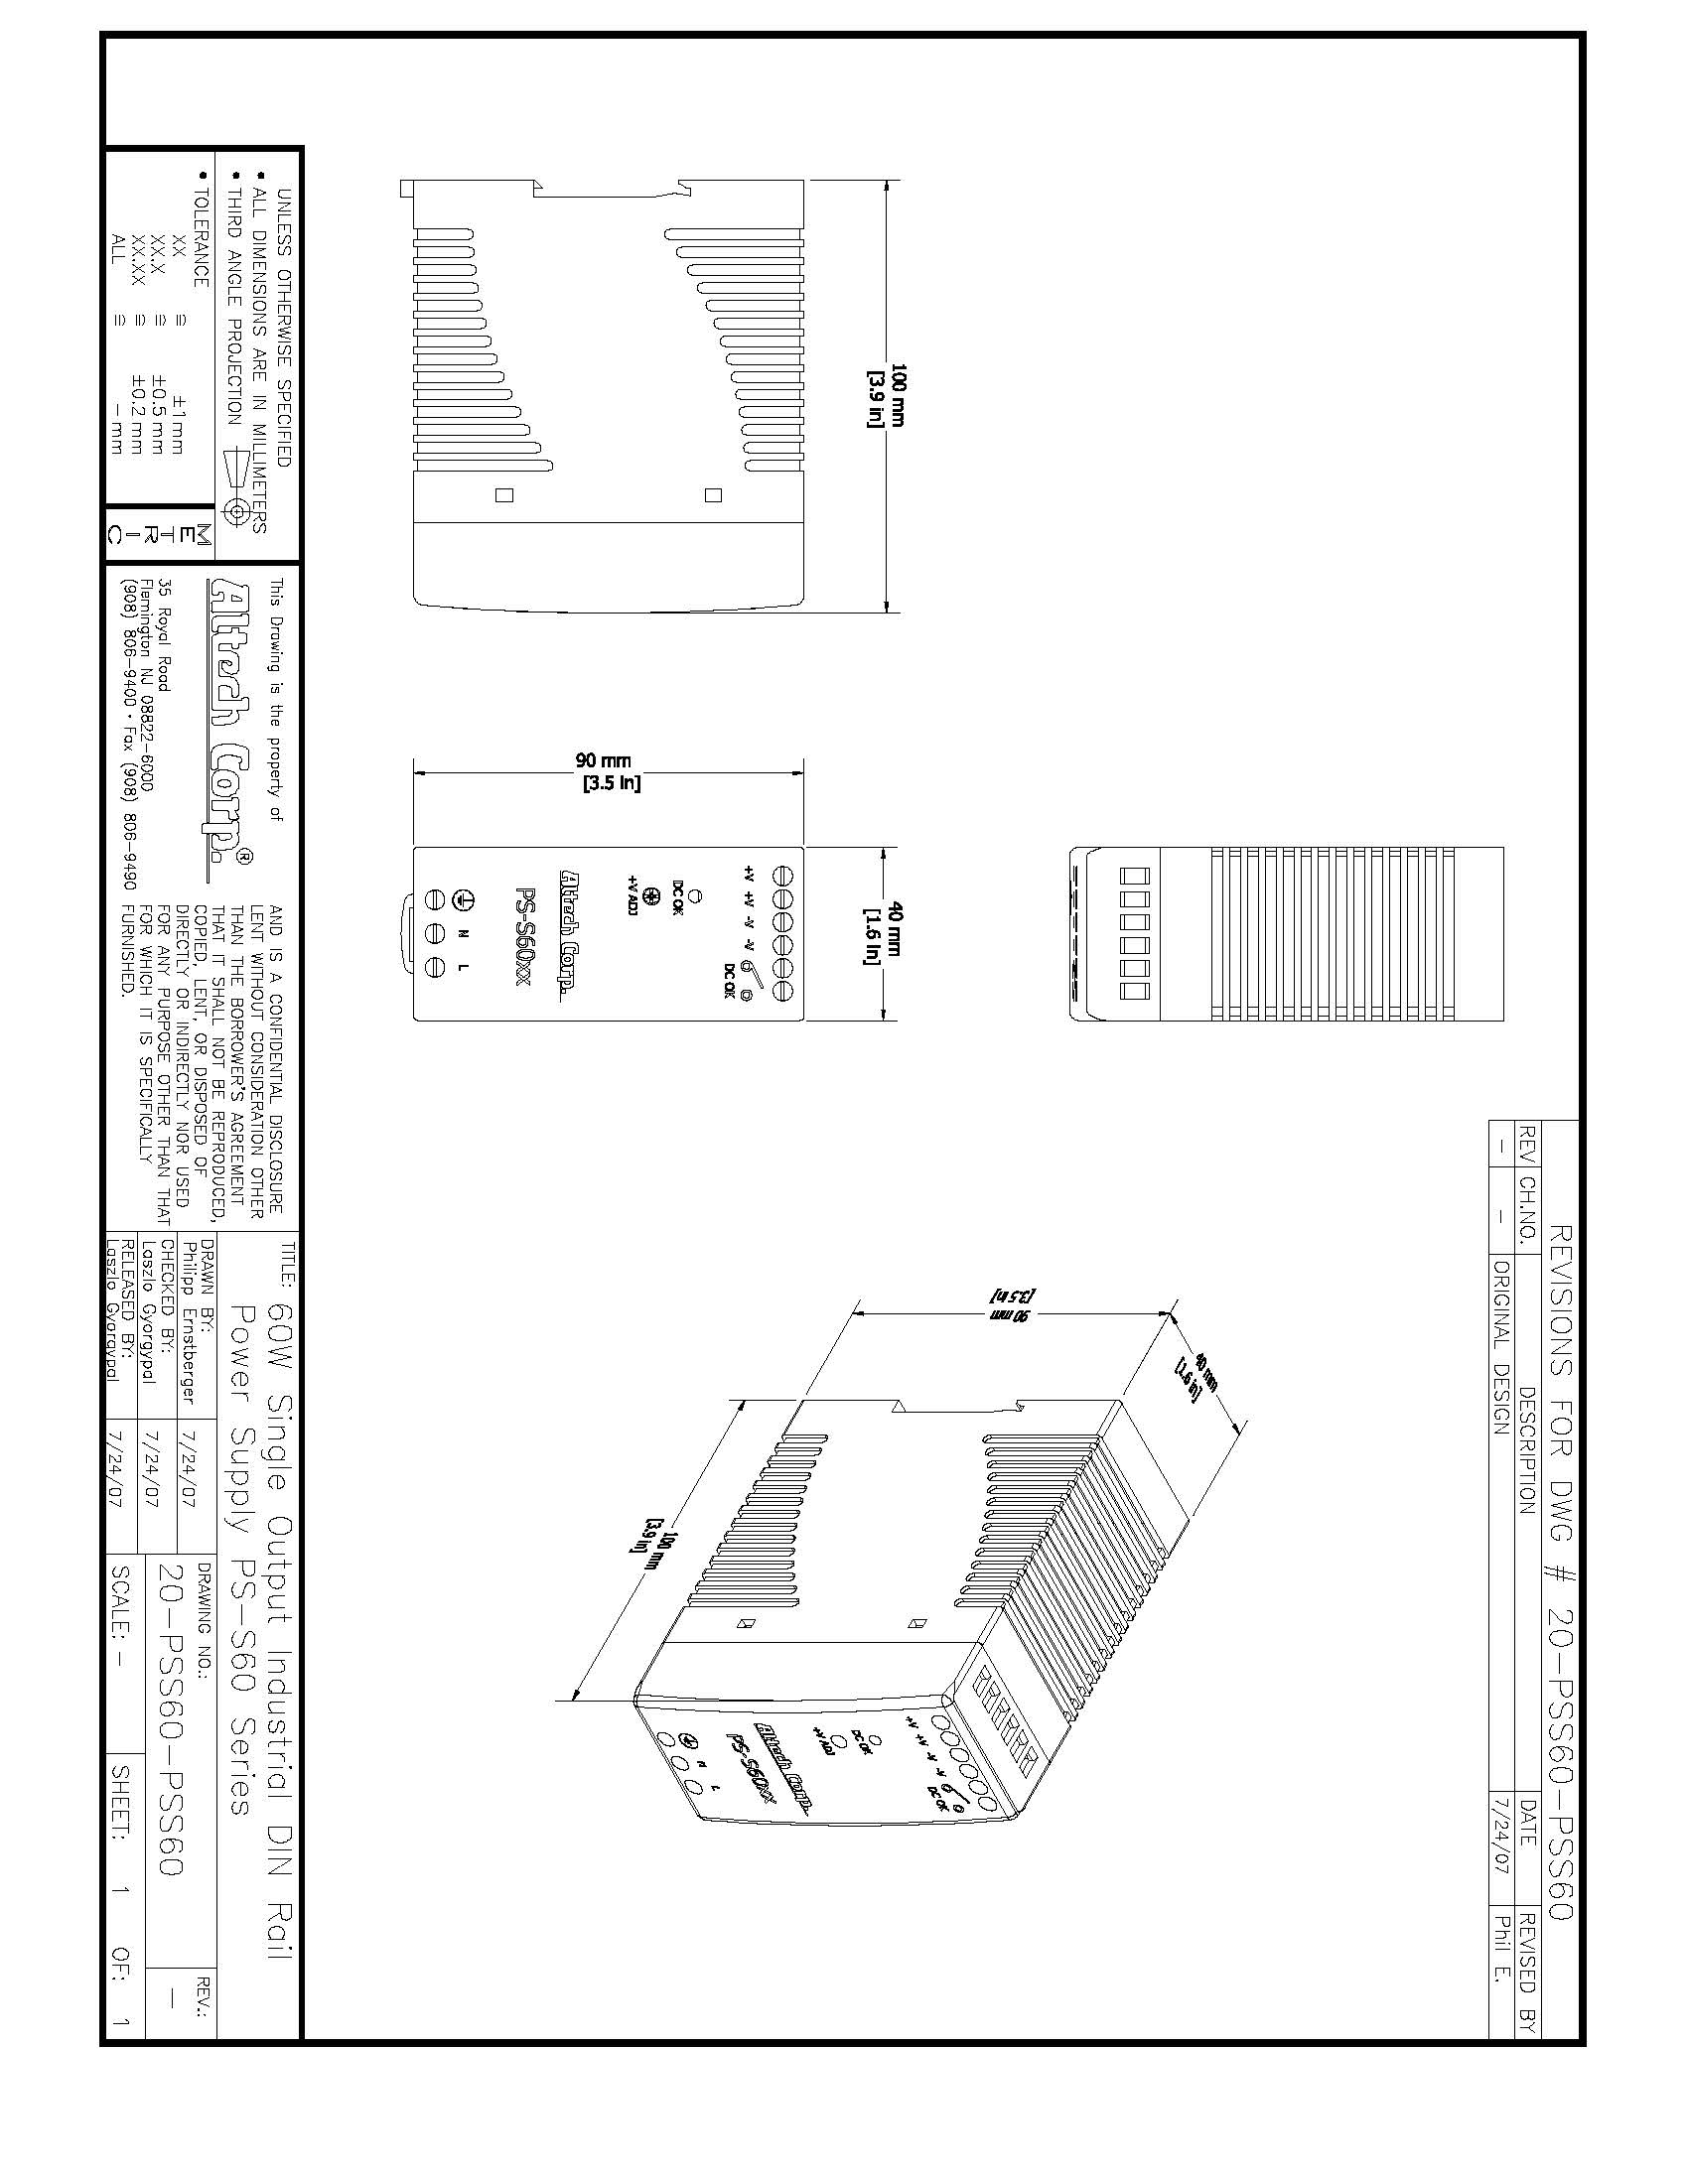 pdf drawing at getdrawings com